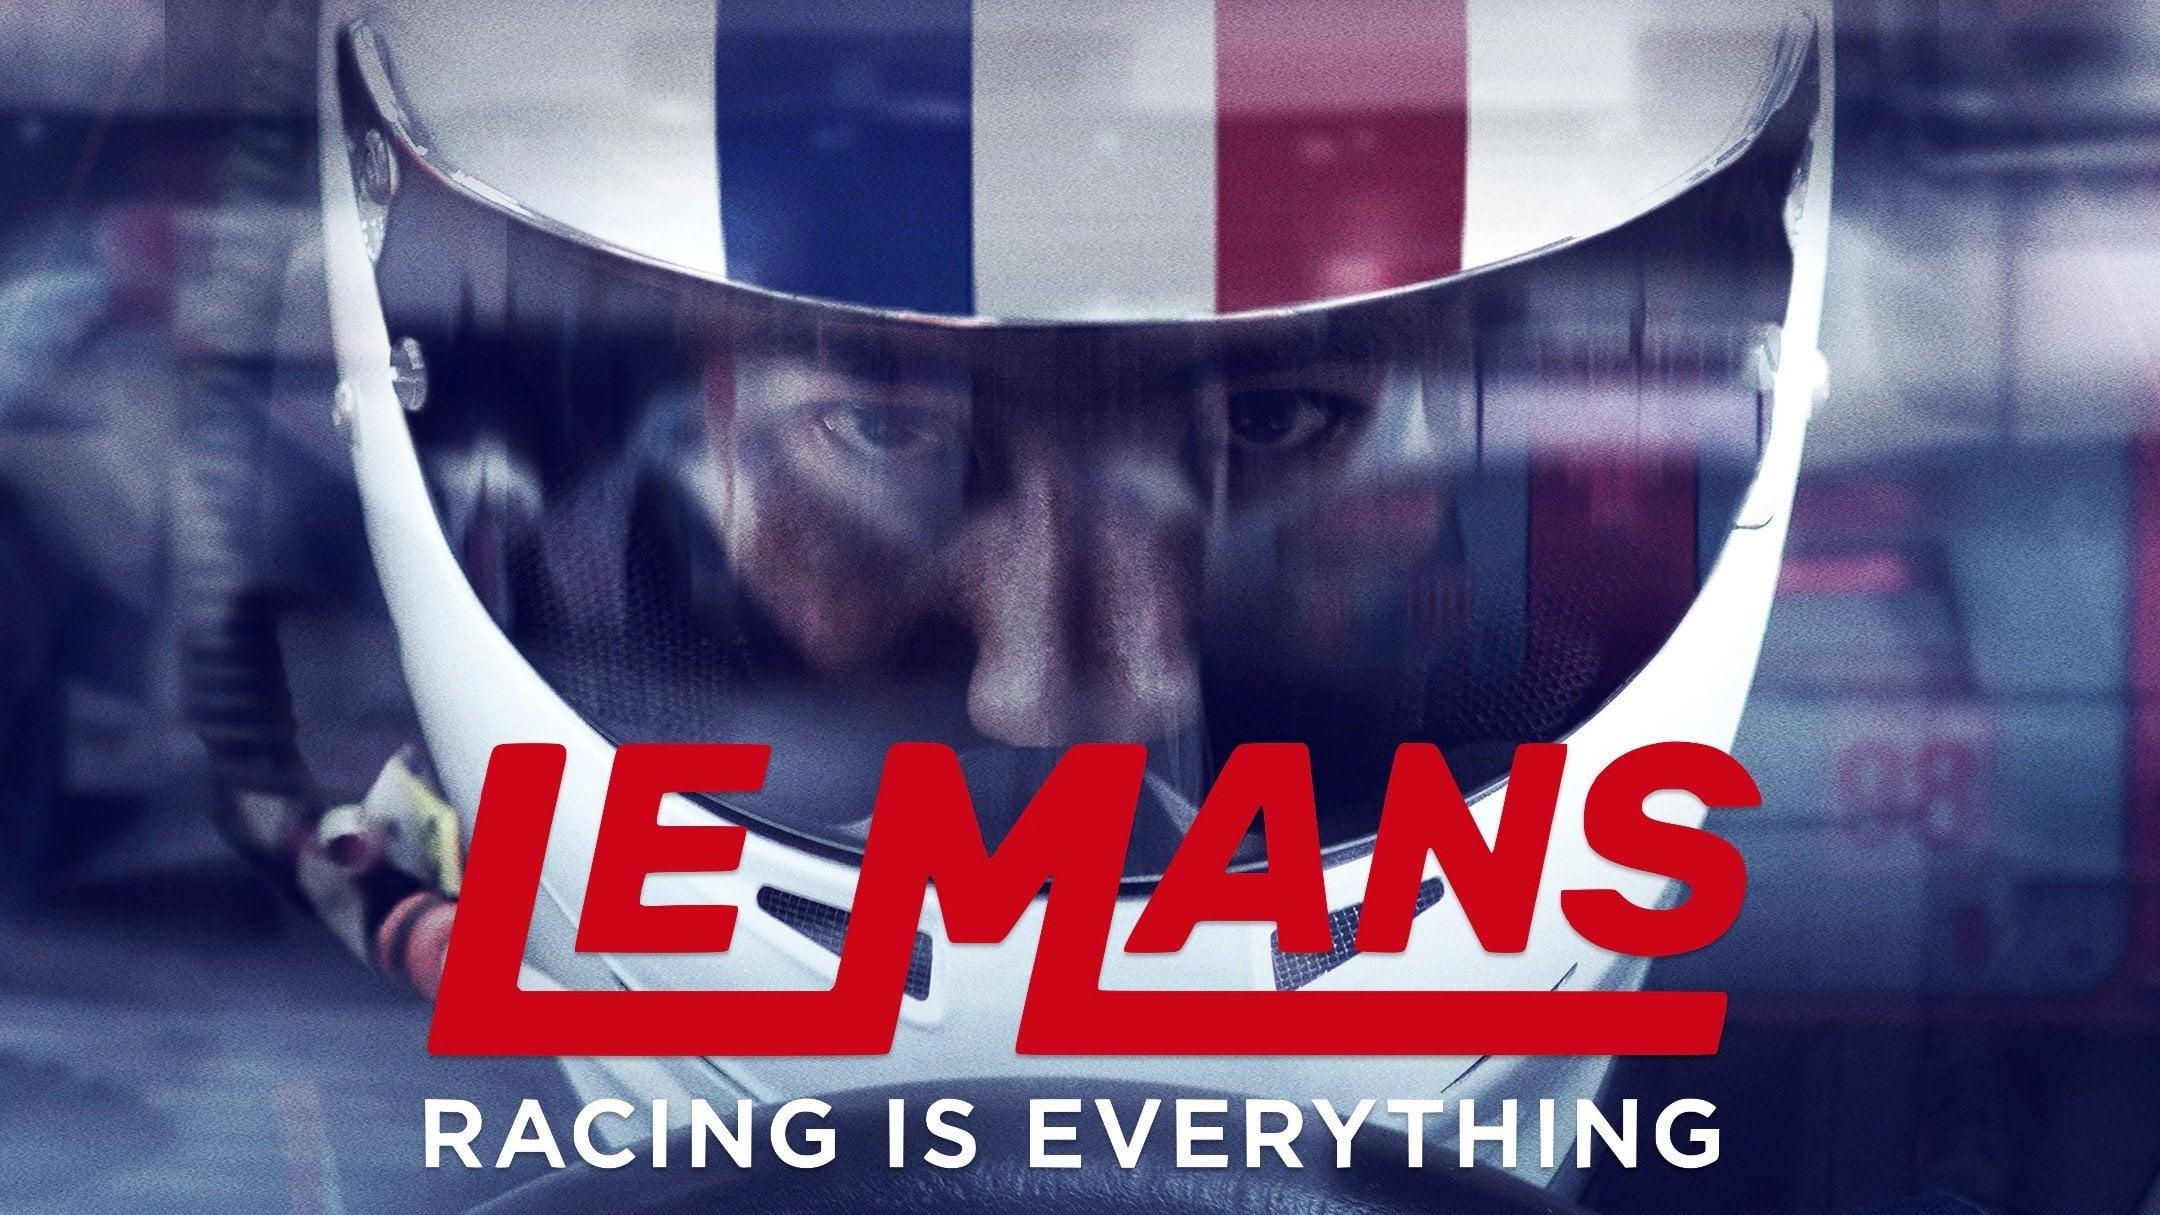 regarder le mans racing is everything pisode complet en ligne gratuit voirgratuit. Black Bedroom Furniture Sets. Home Design Ideas